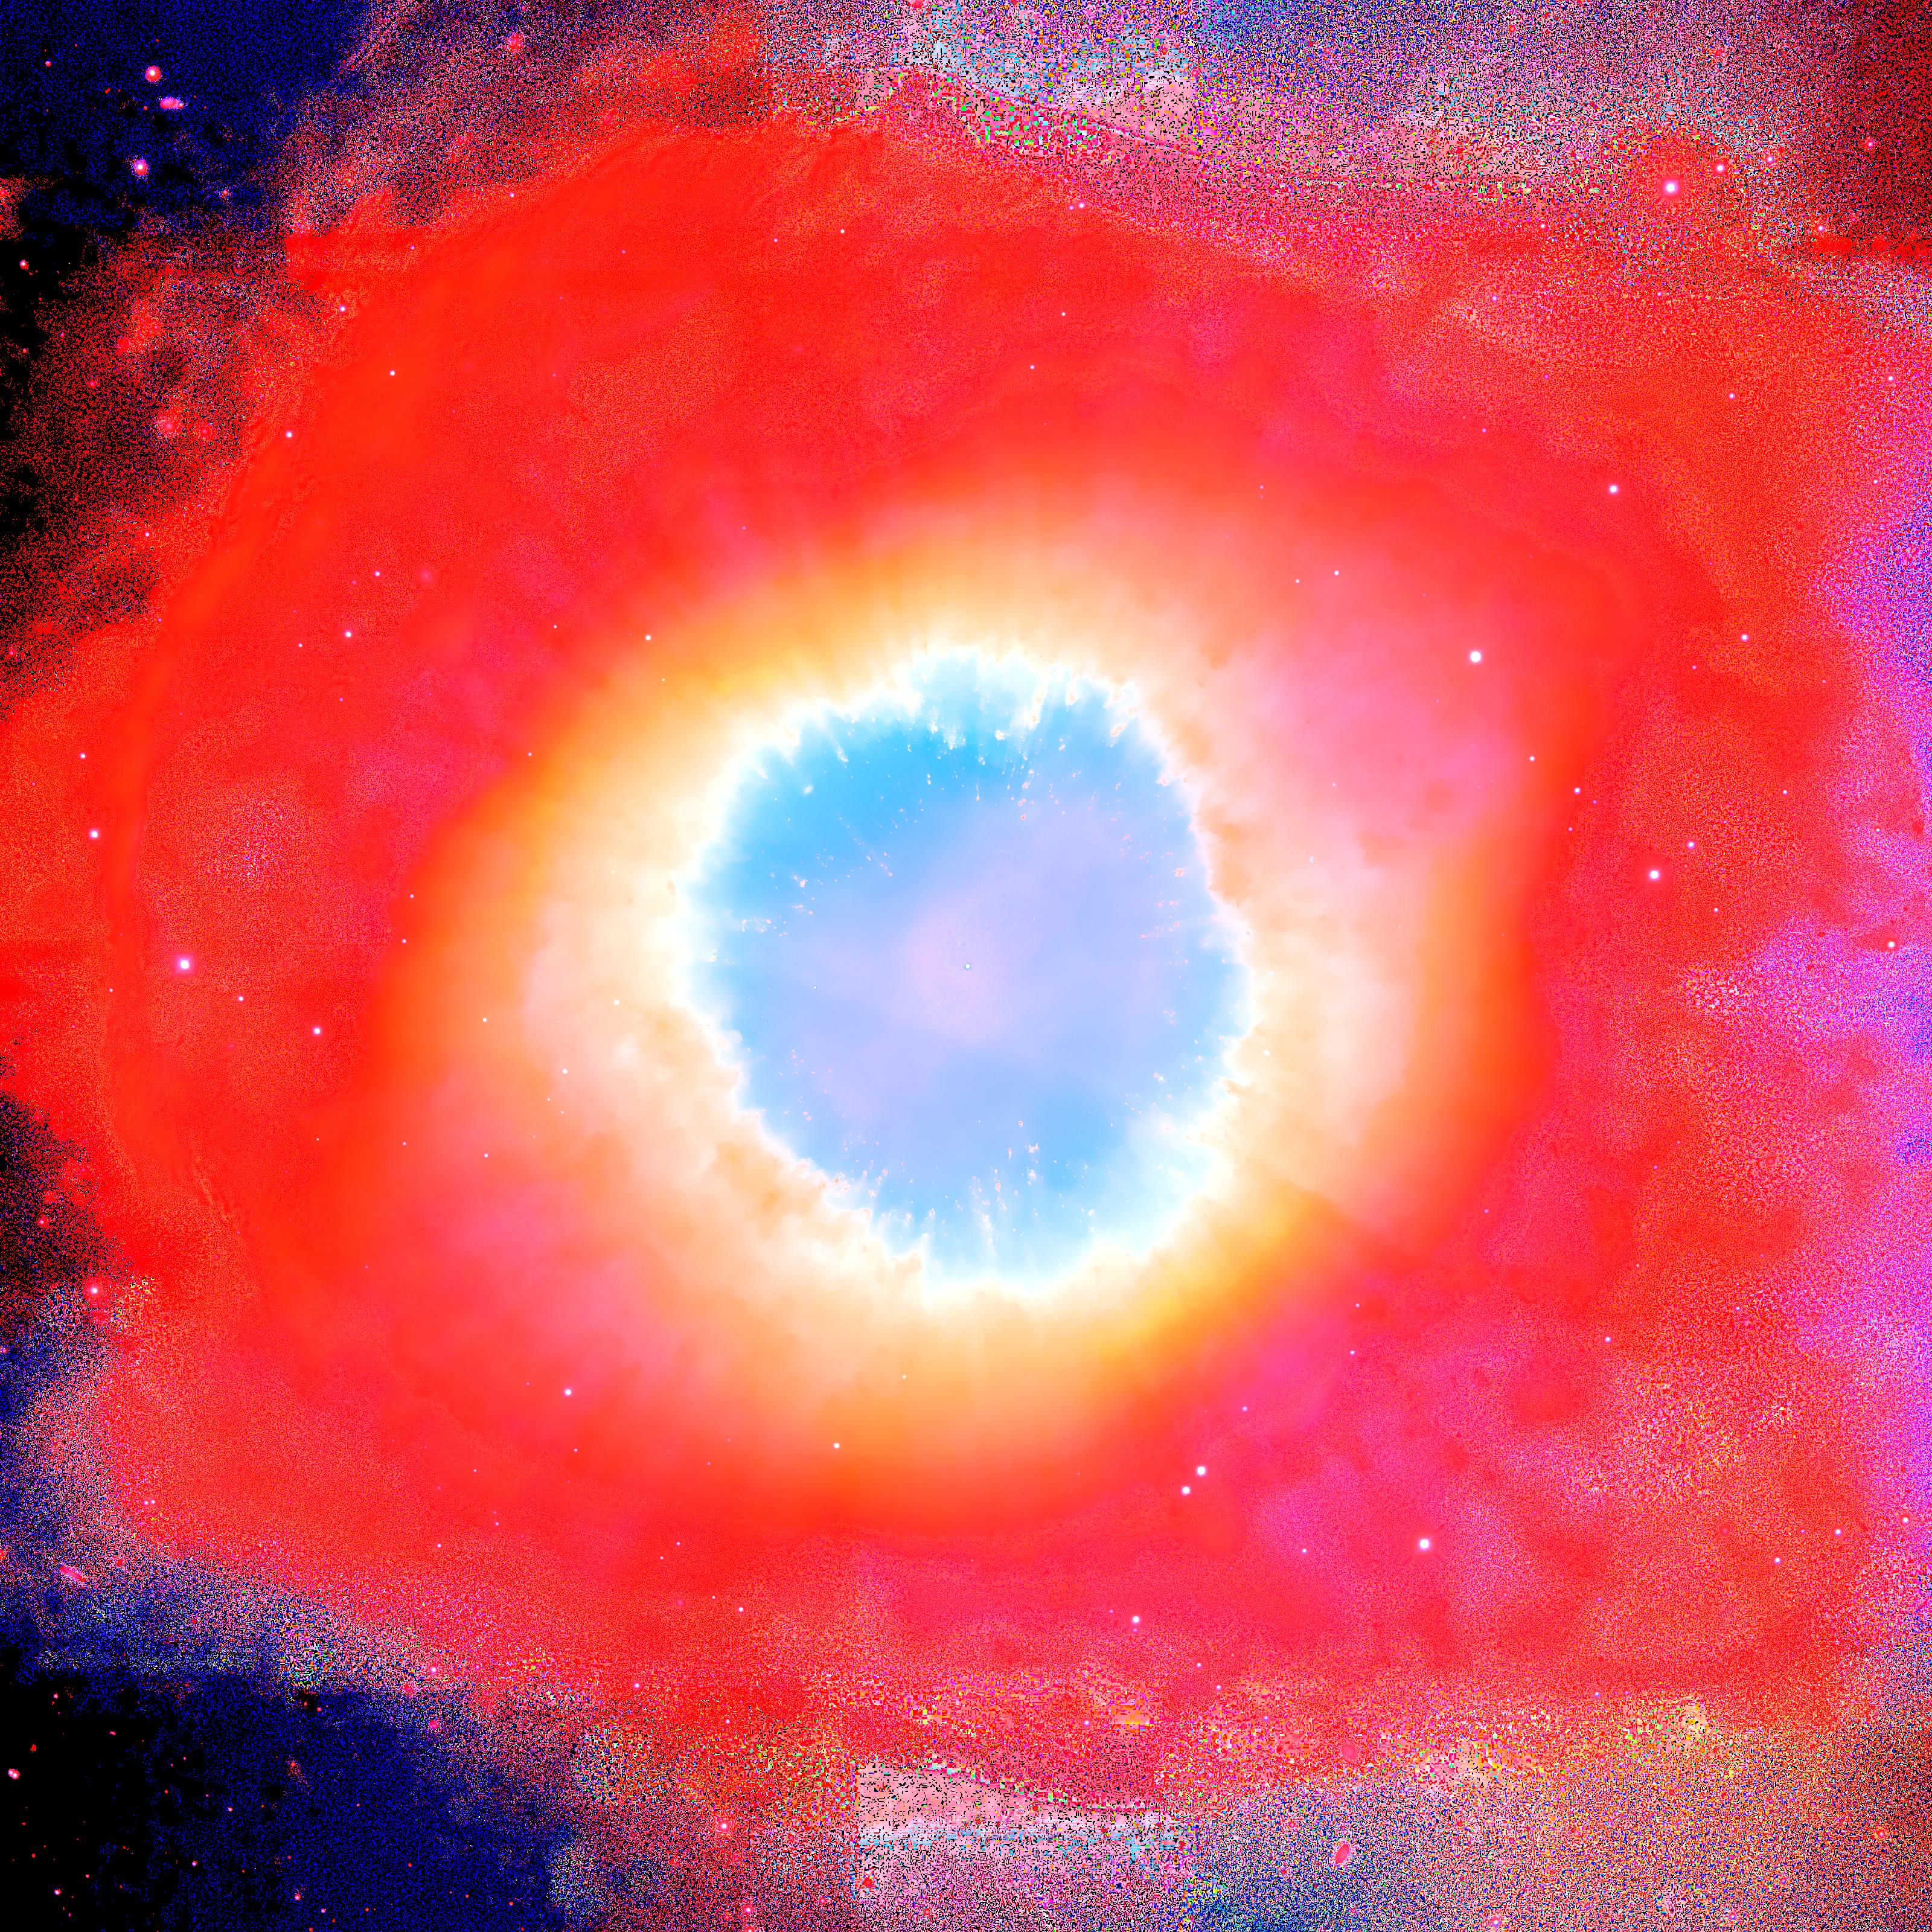 File:Translucent Helix Nebula.png.